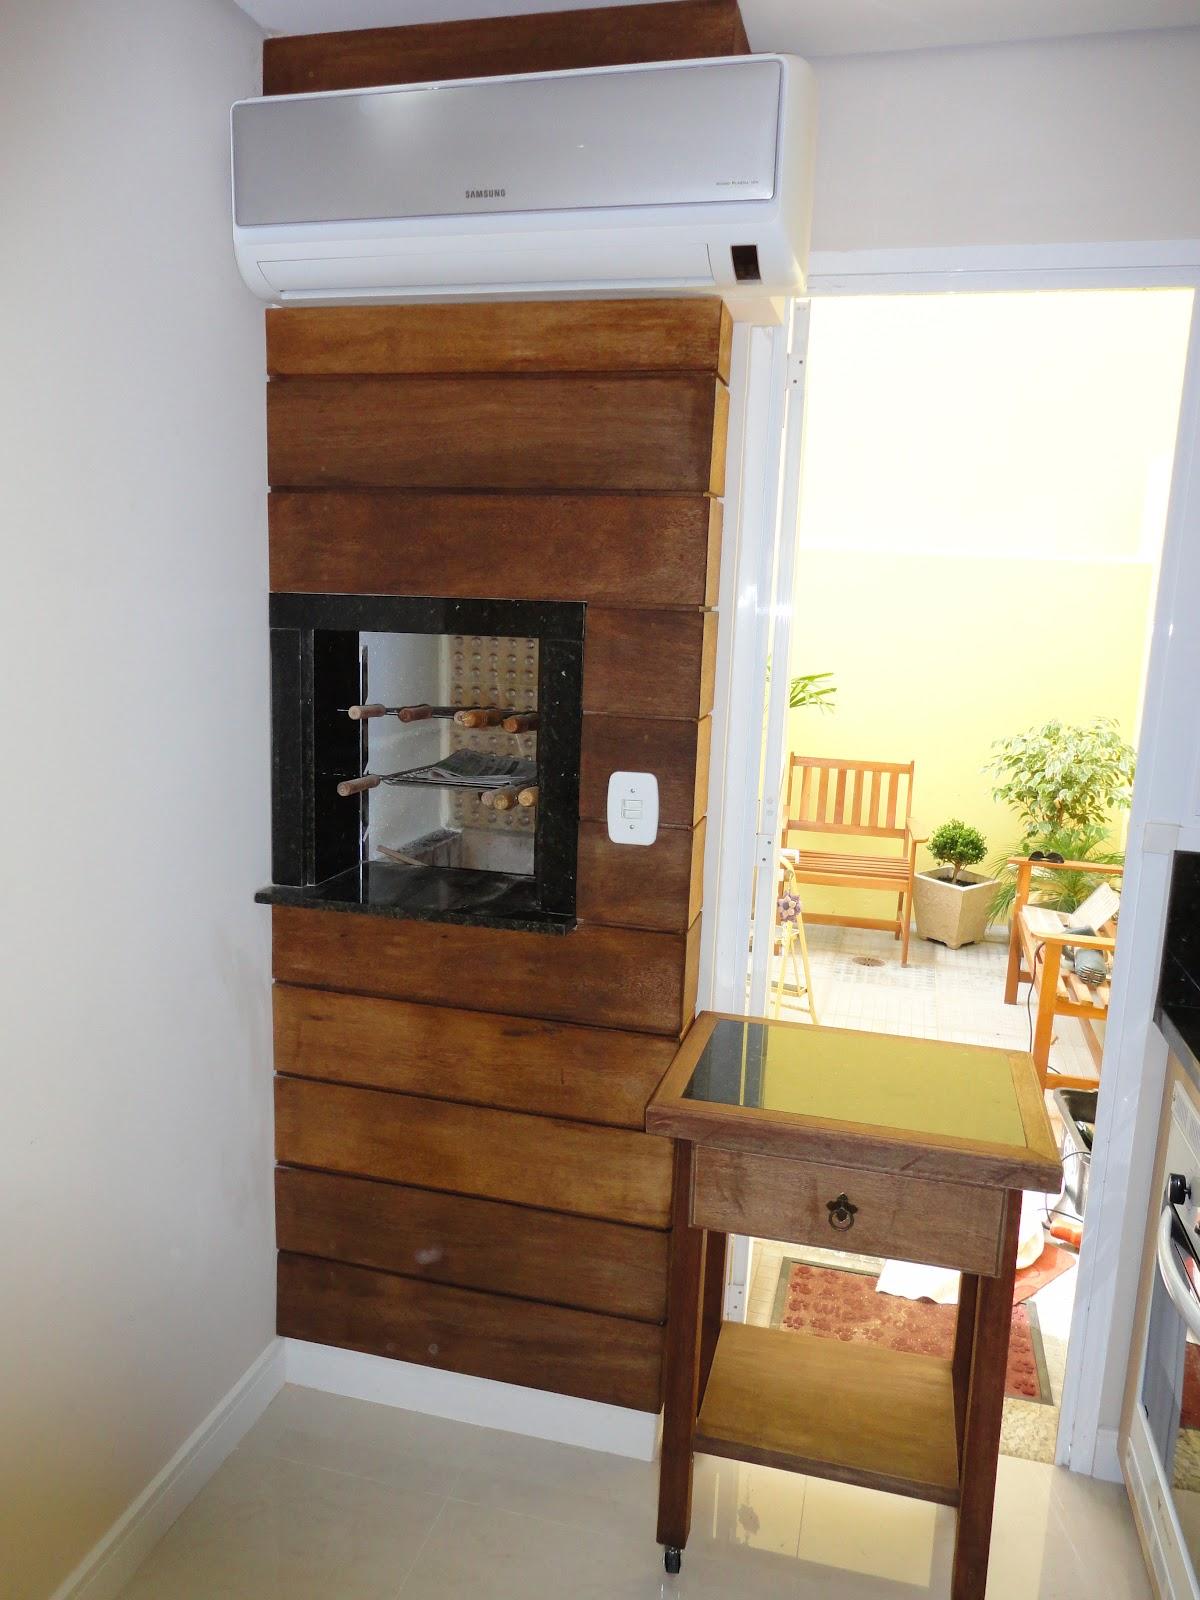 Painel de madeira na churrasqueira mais mesa auxiliar para churrasco #9A6931 1200x1600